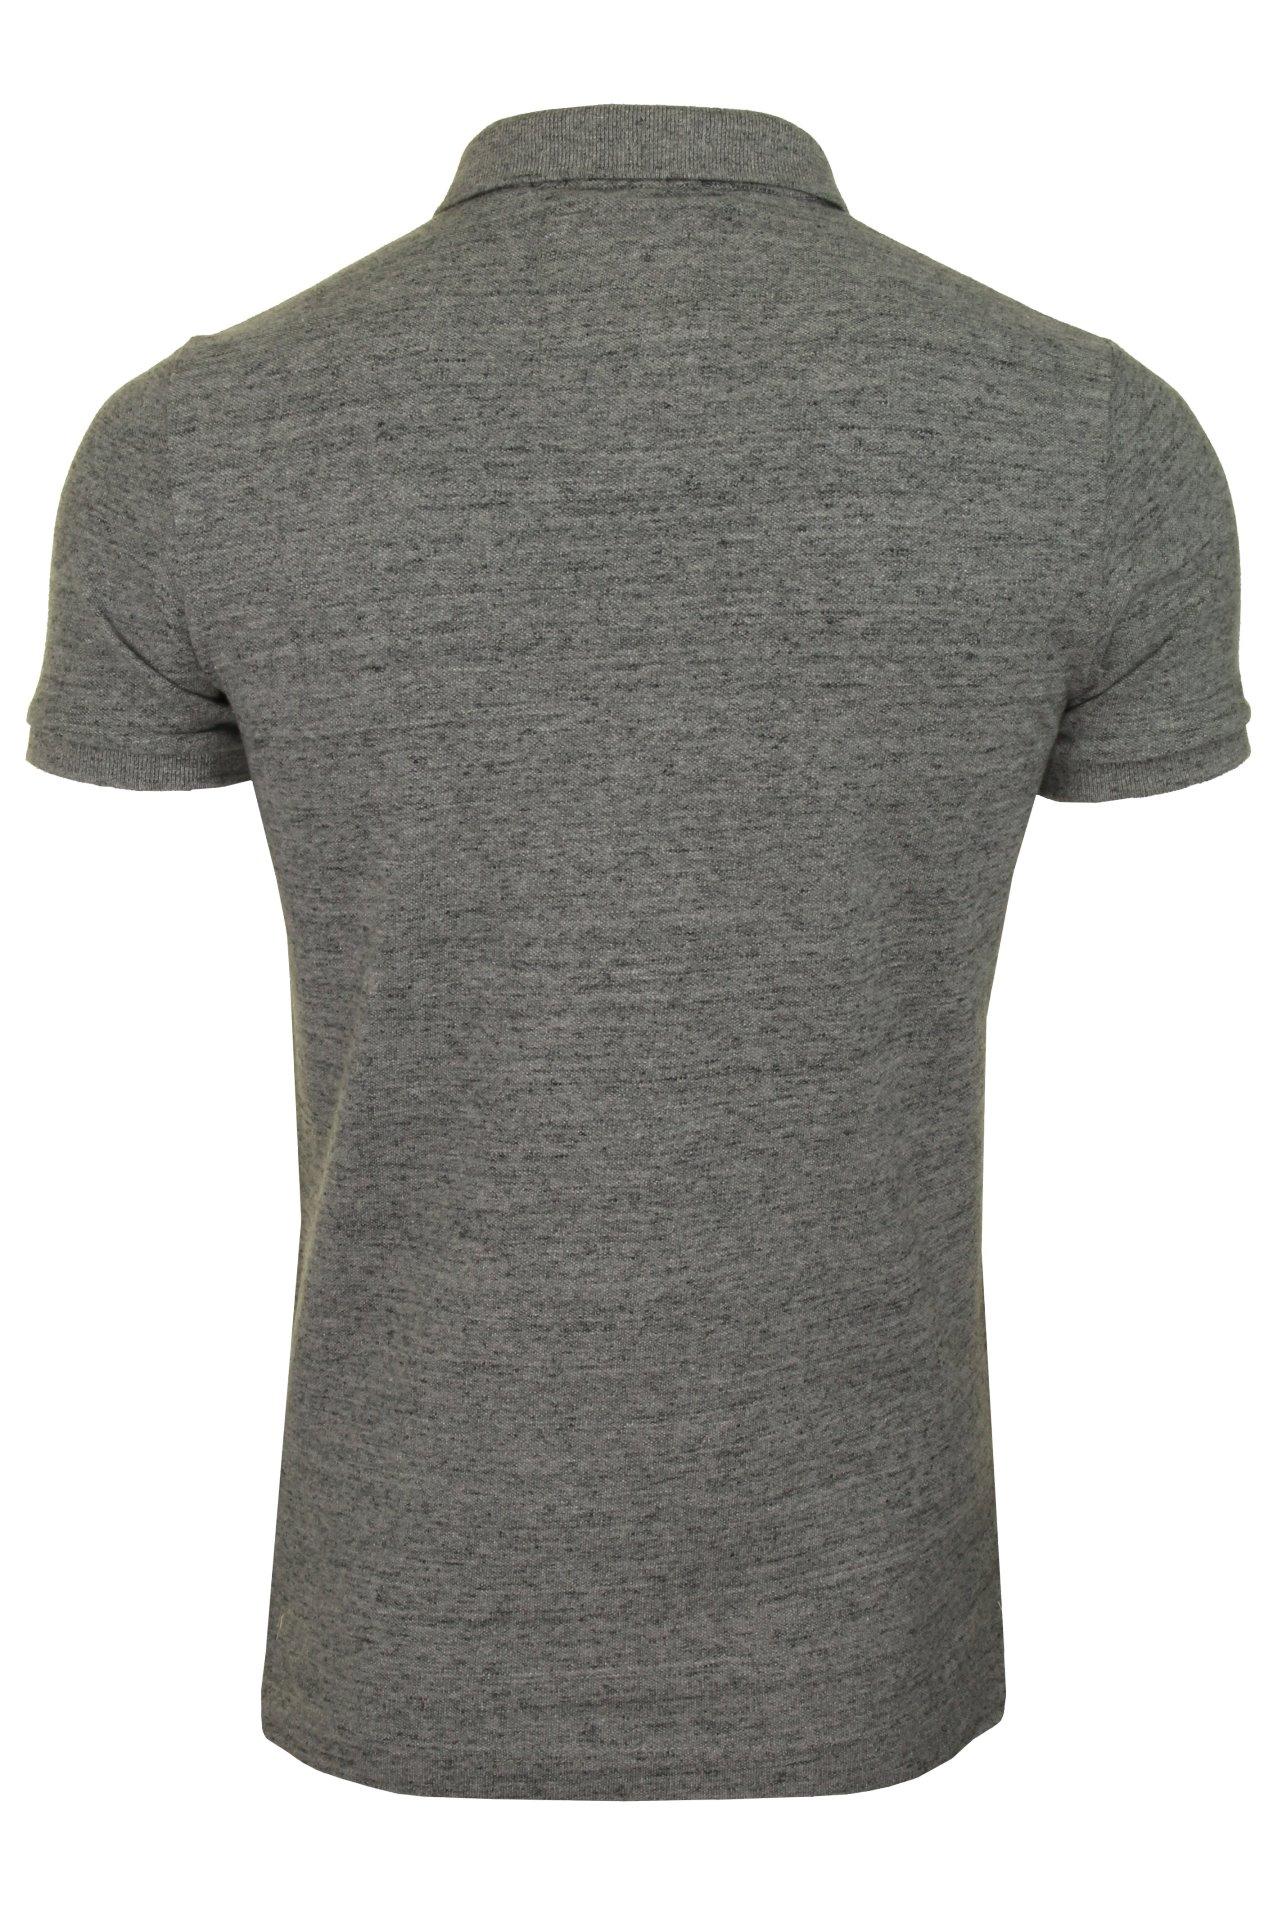 Camisa-clasica-para-hombre-039-Camiseta-Polo-Pique-039 miniatura 11